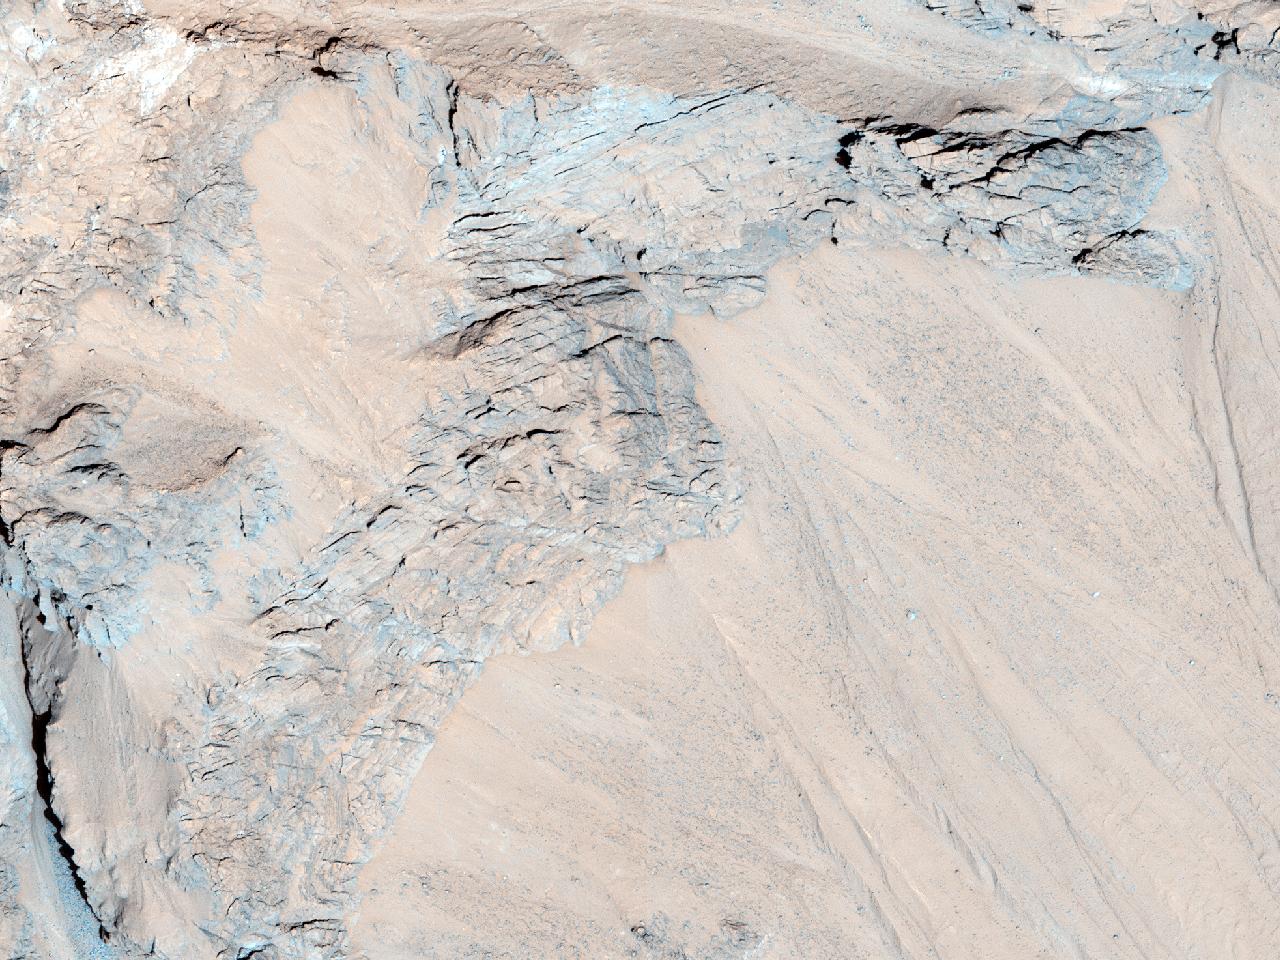 Овраги в кратере Azimov